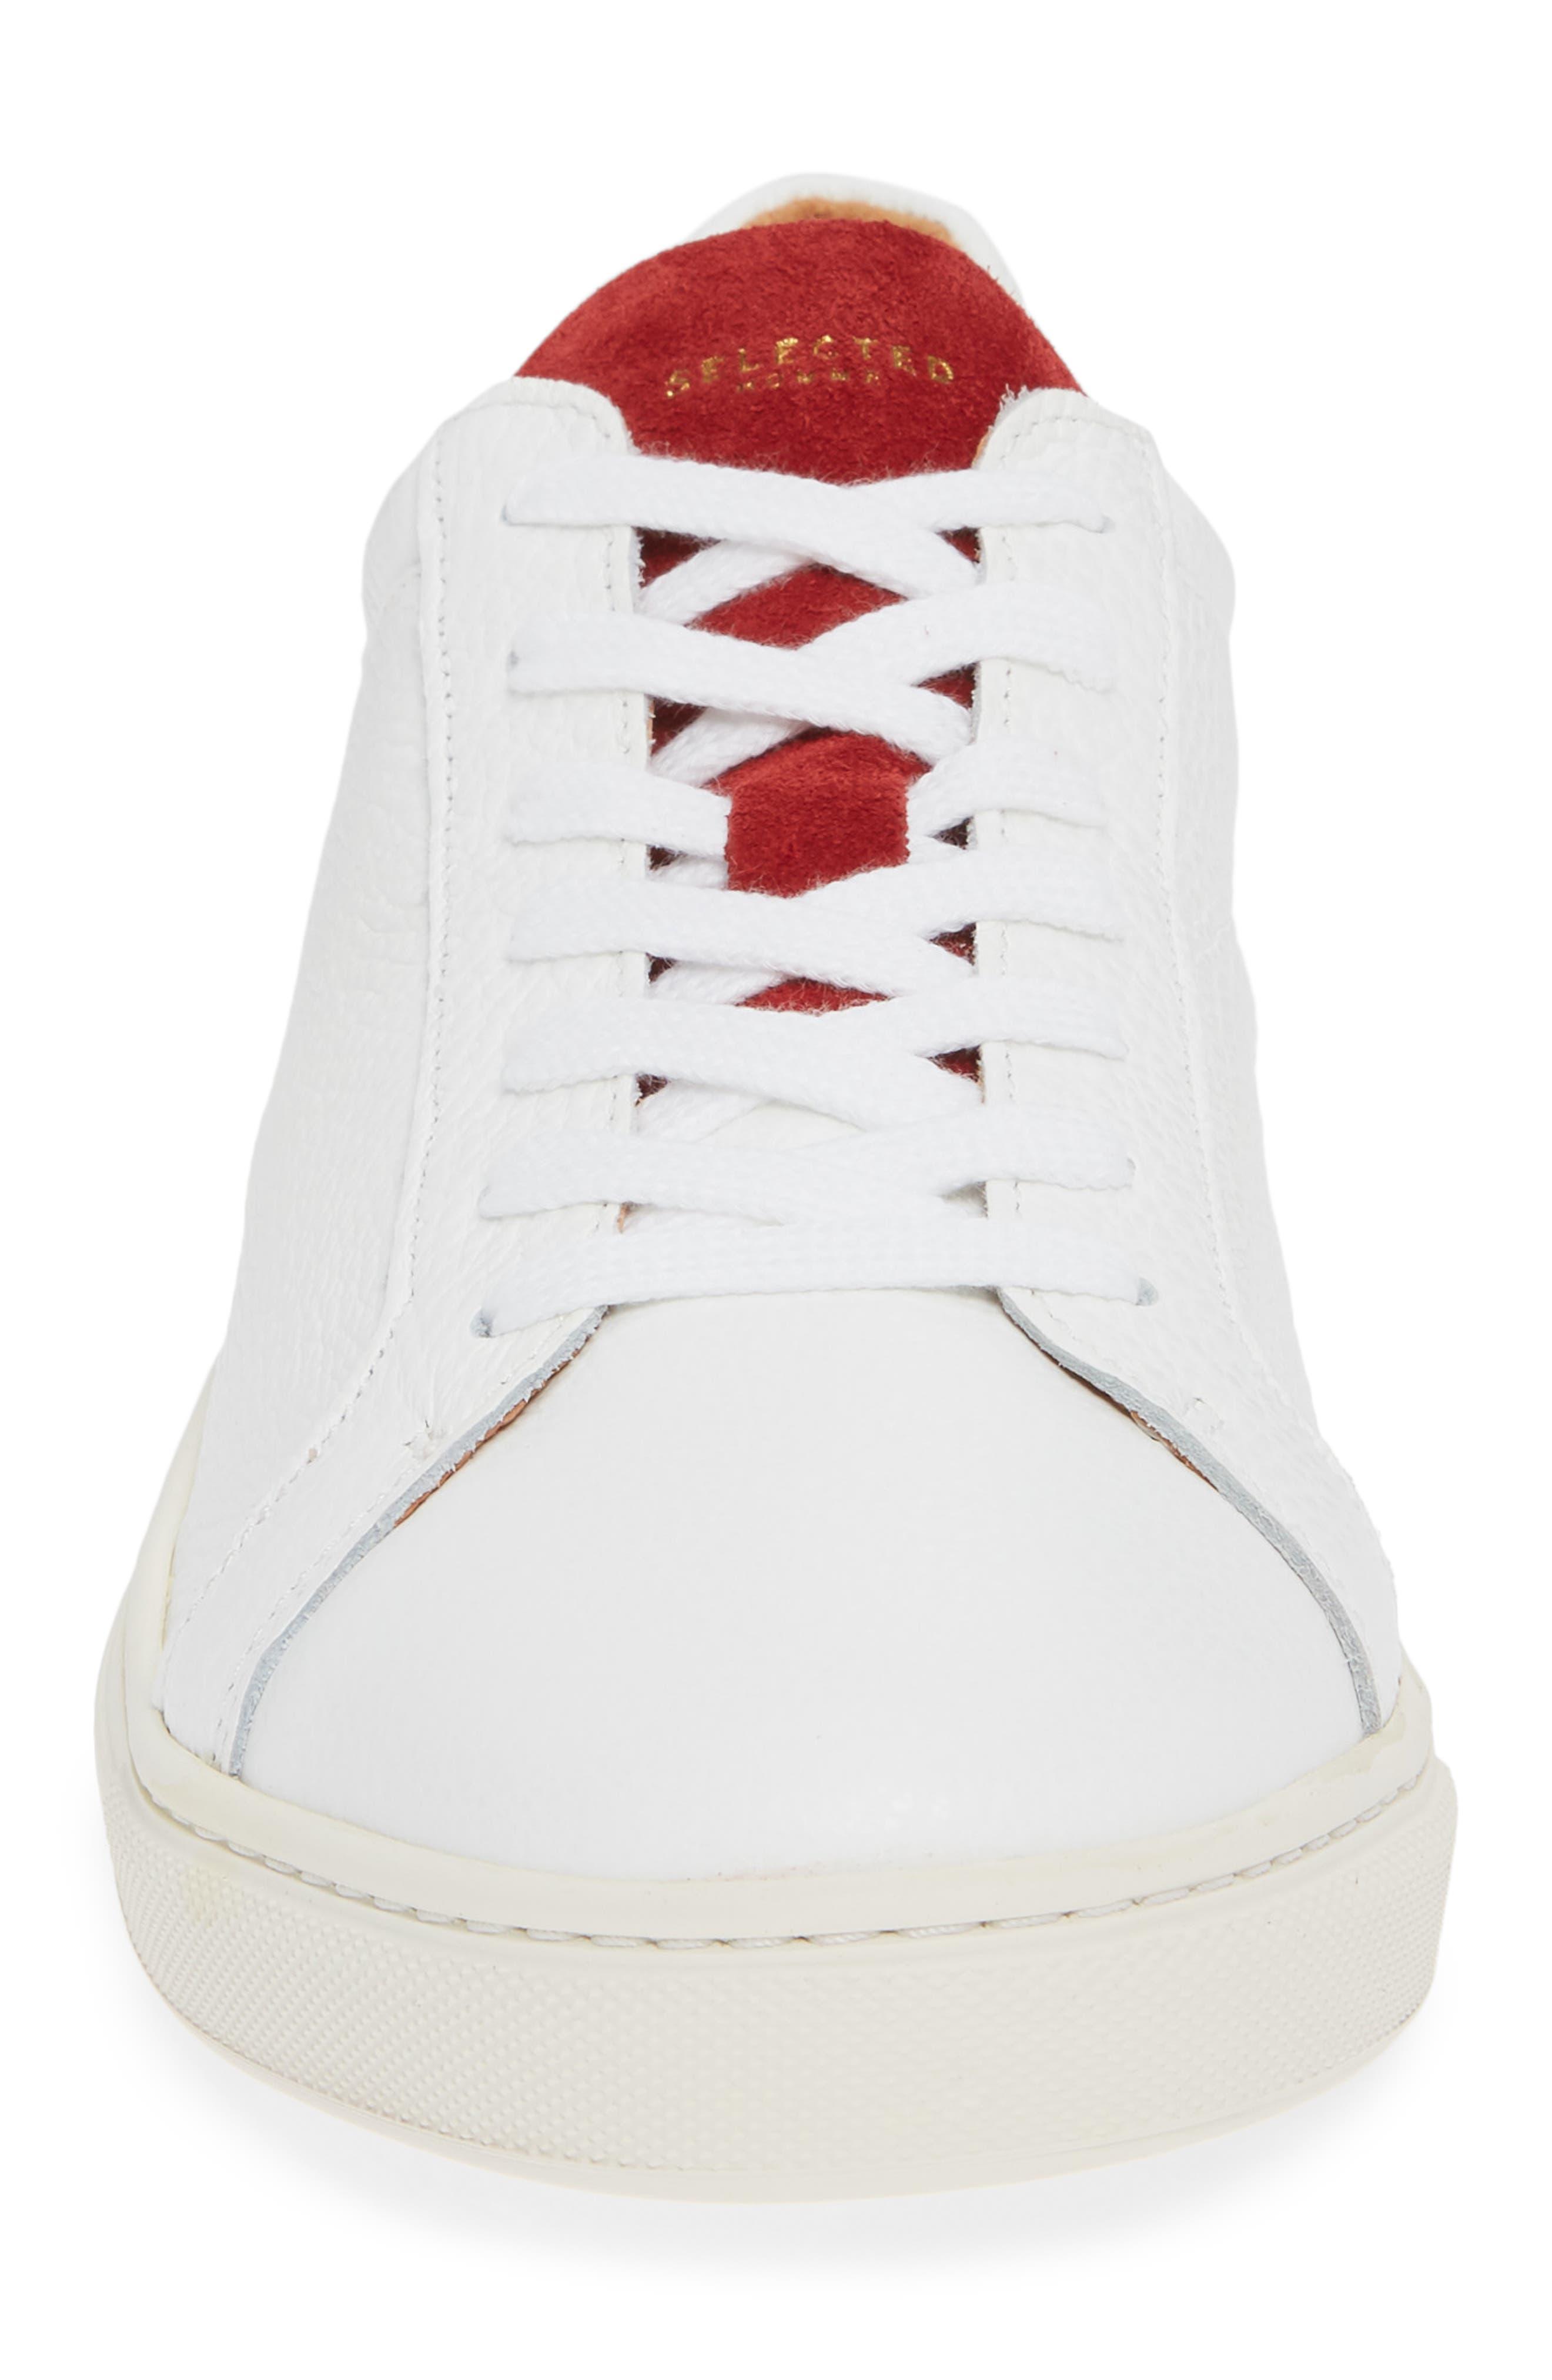 David Colorblock Sneaker,                             Alternate thumbnail 4, color,                             WHITE/ BARBADOS CHERRY